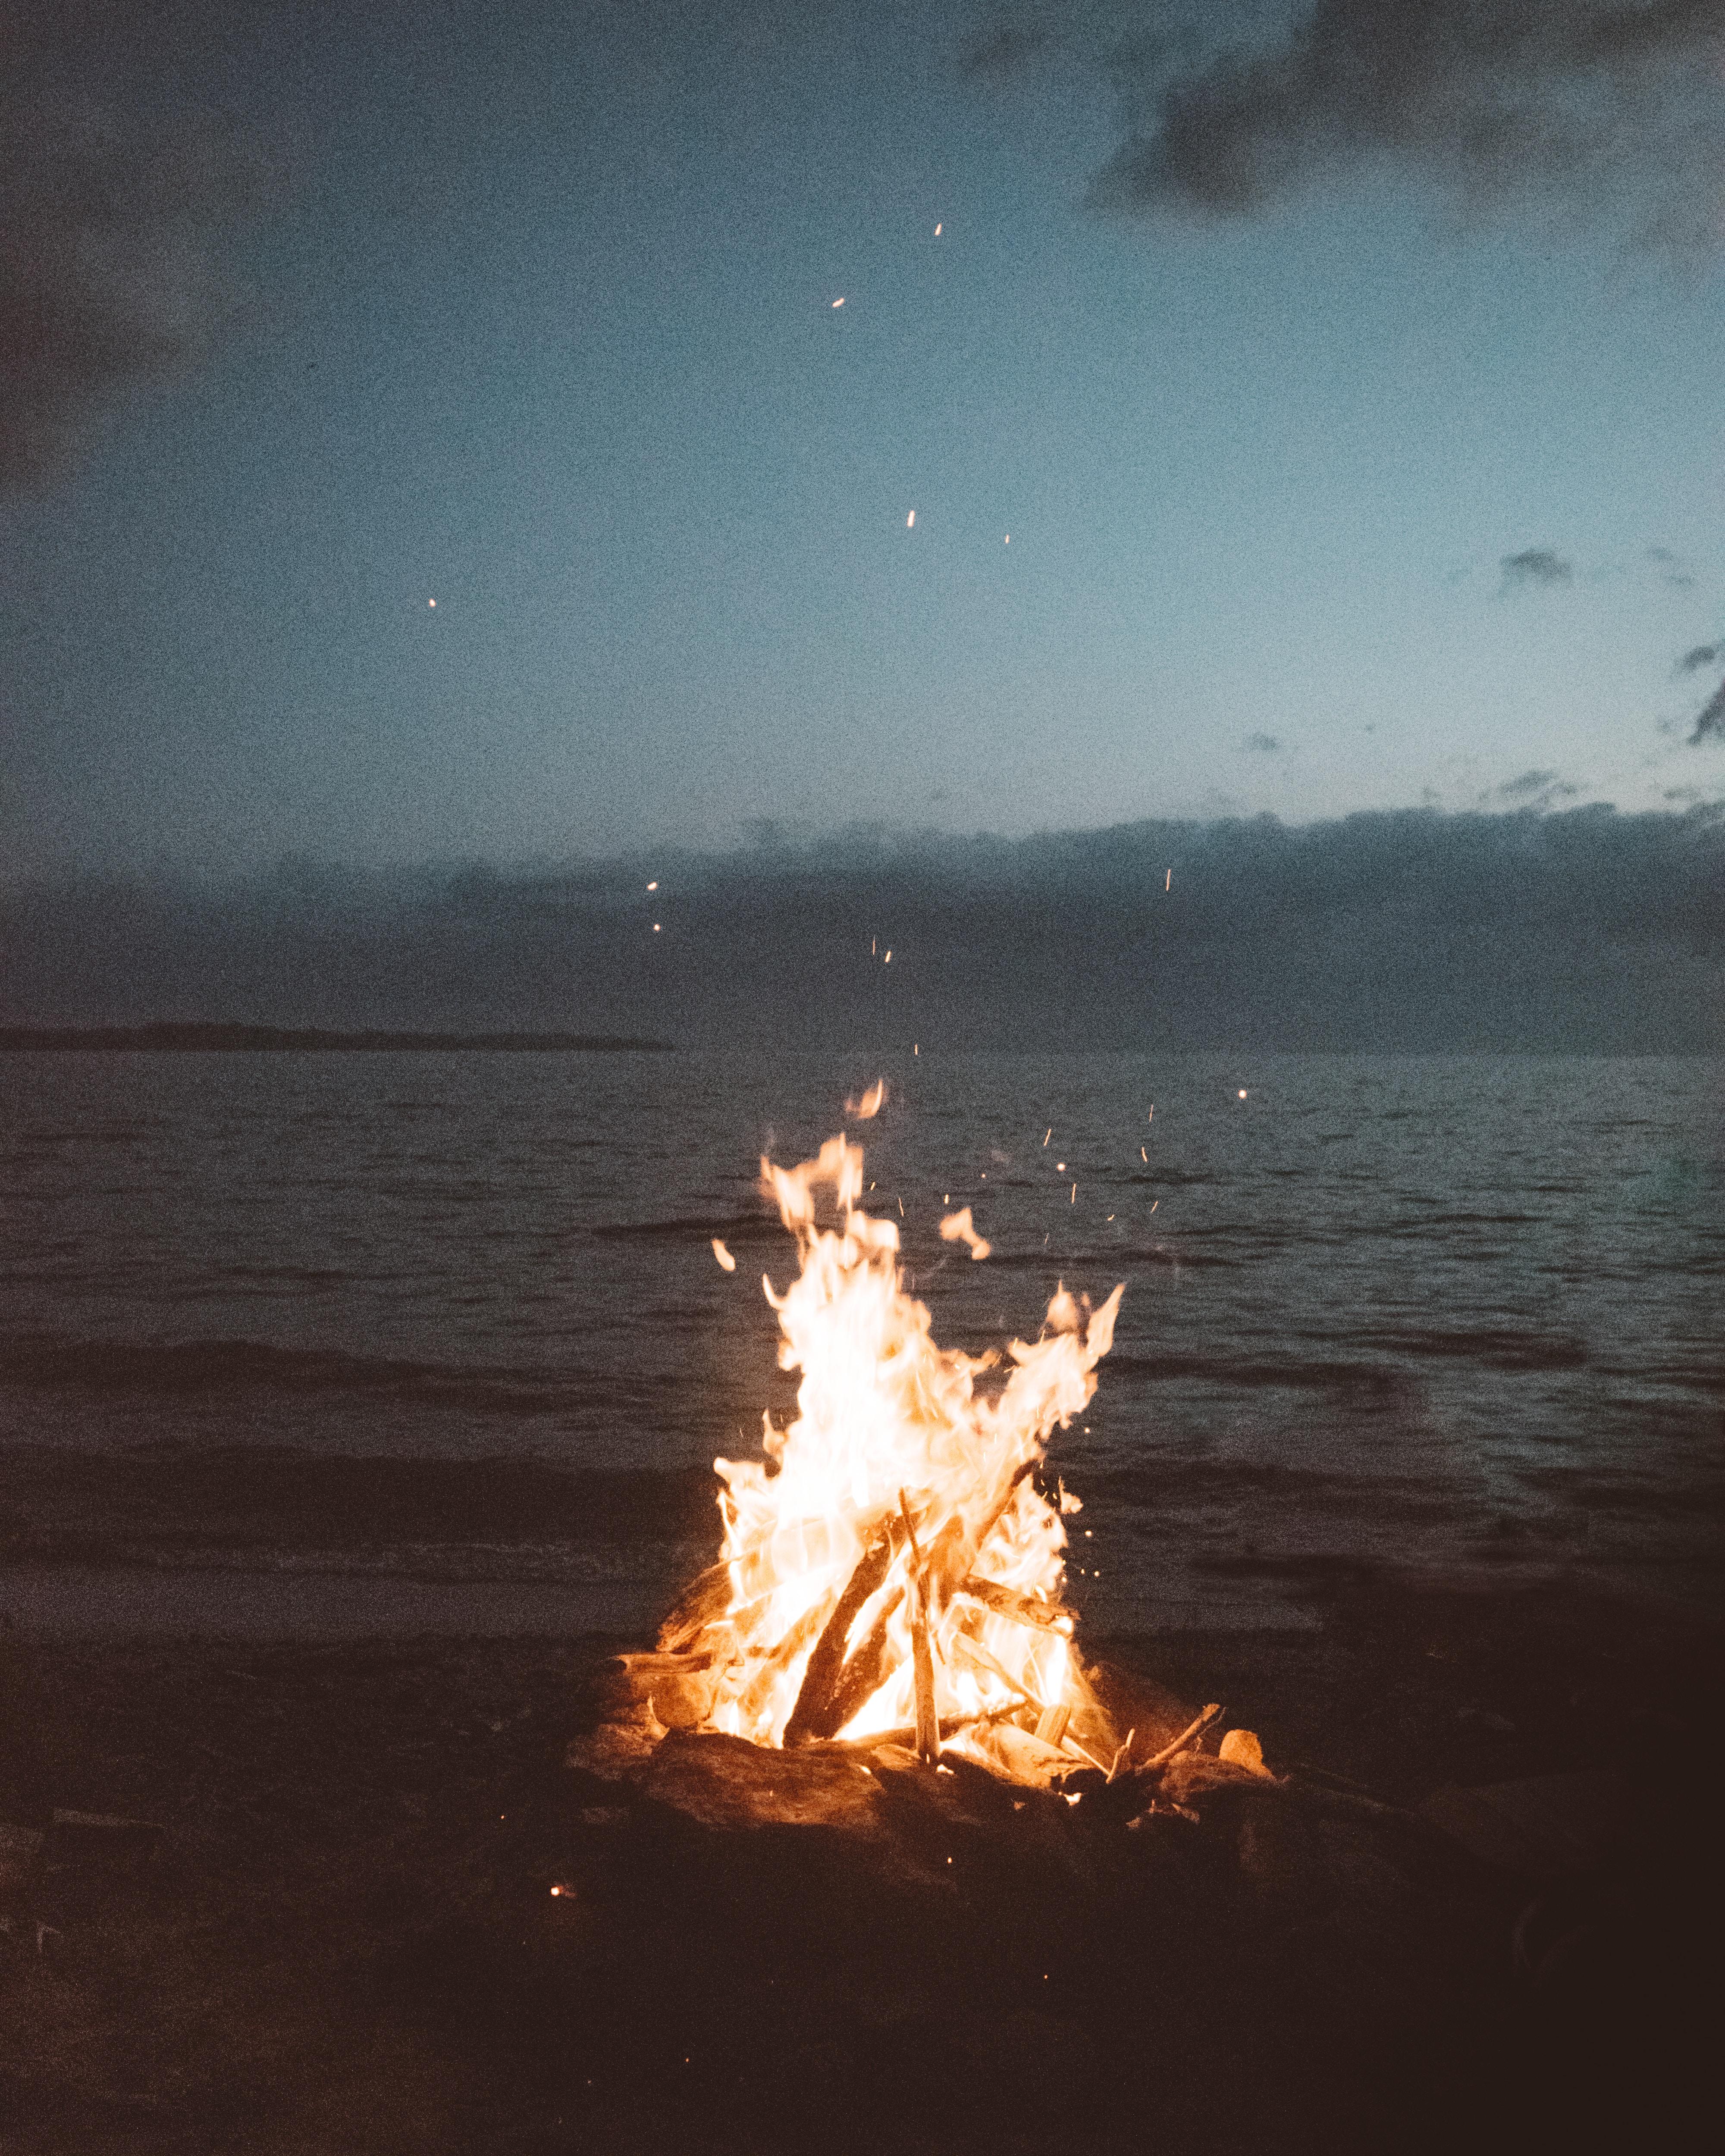 bonfire near seashore during nighttime